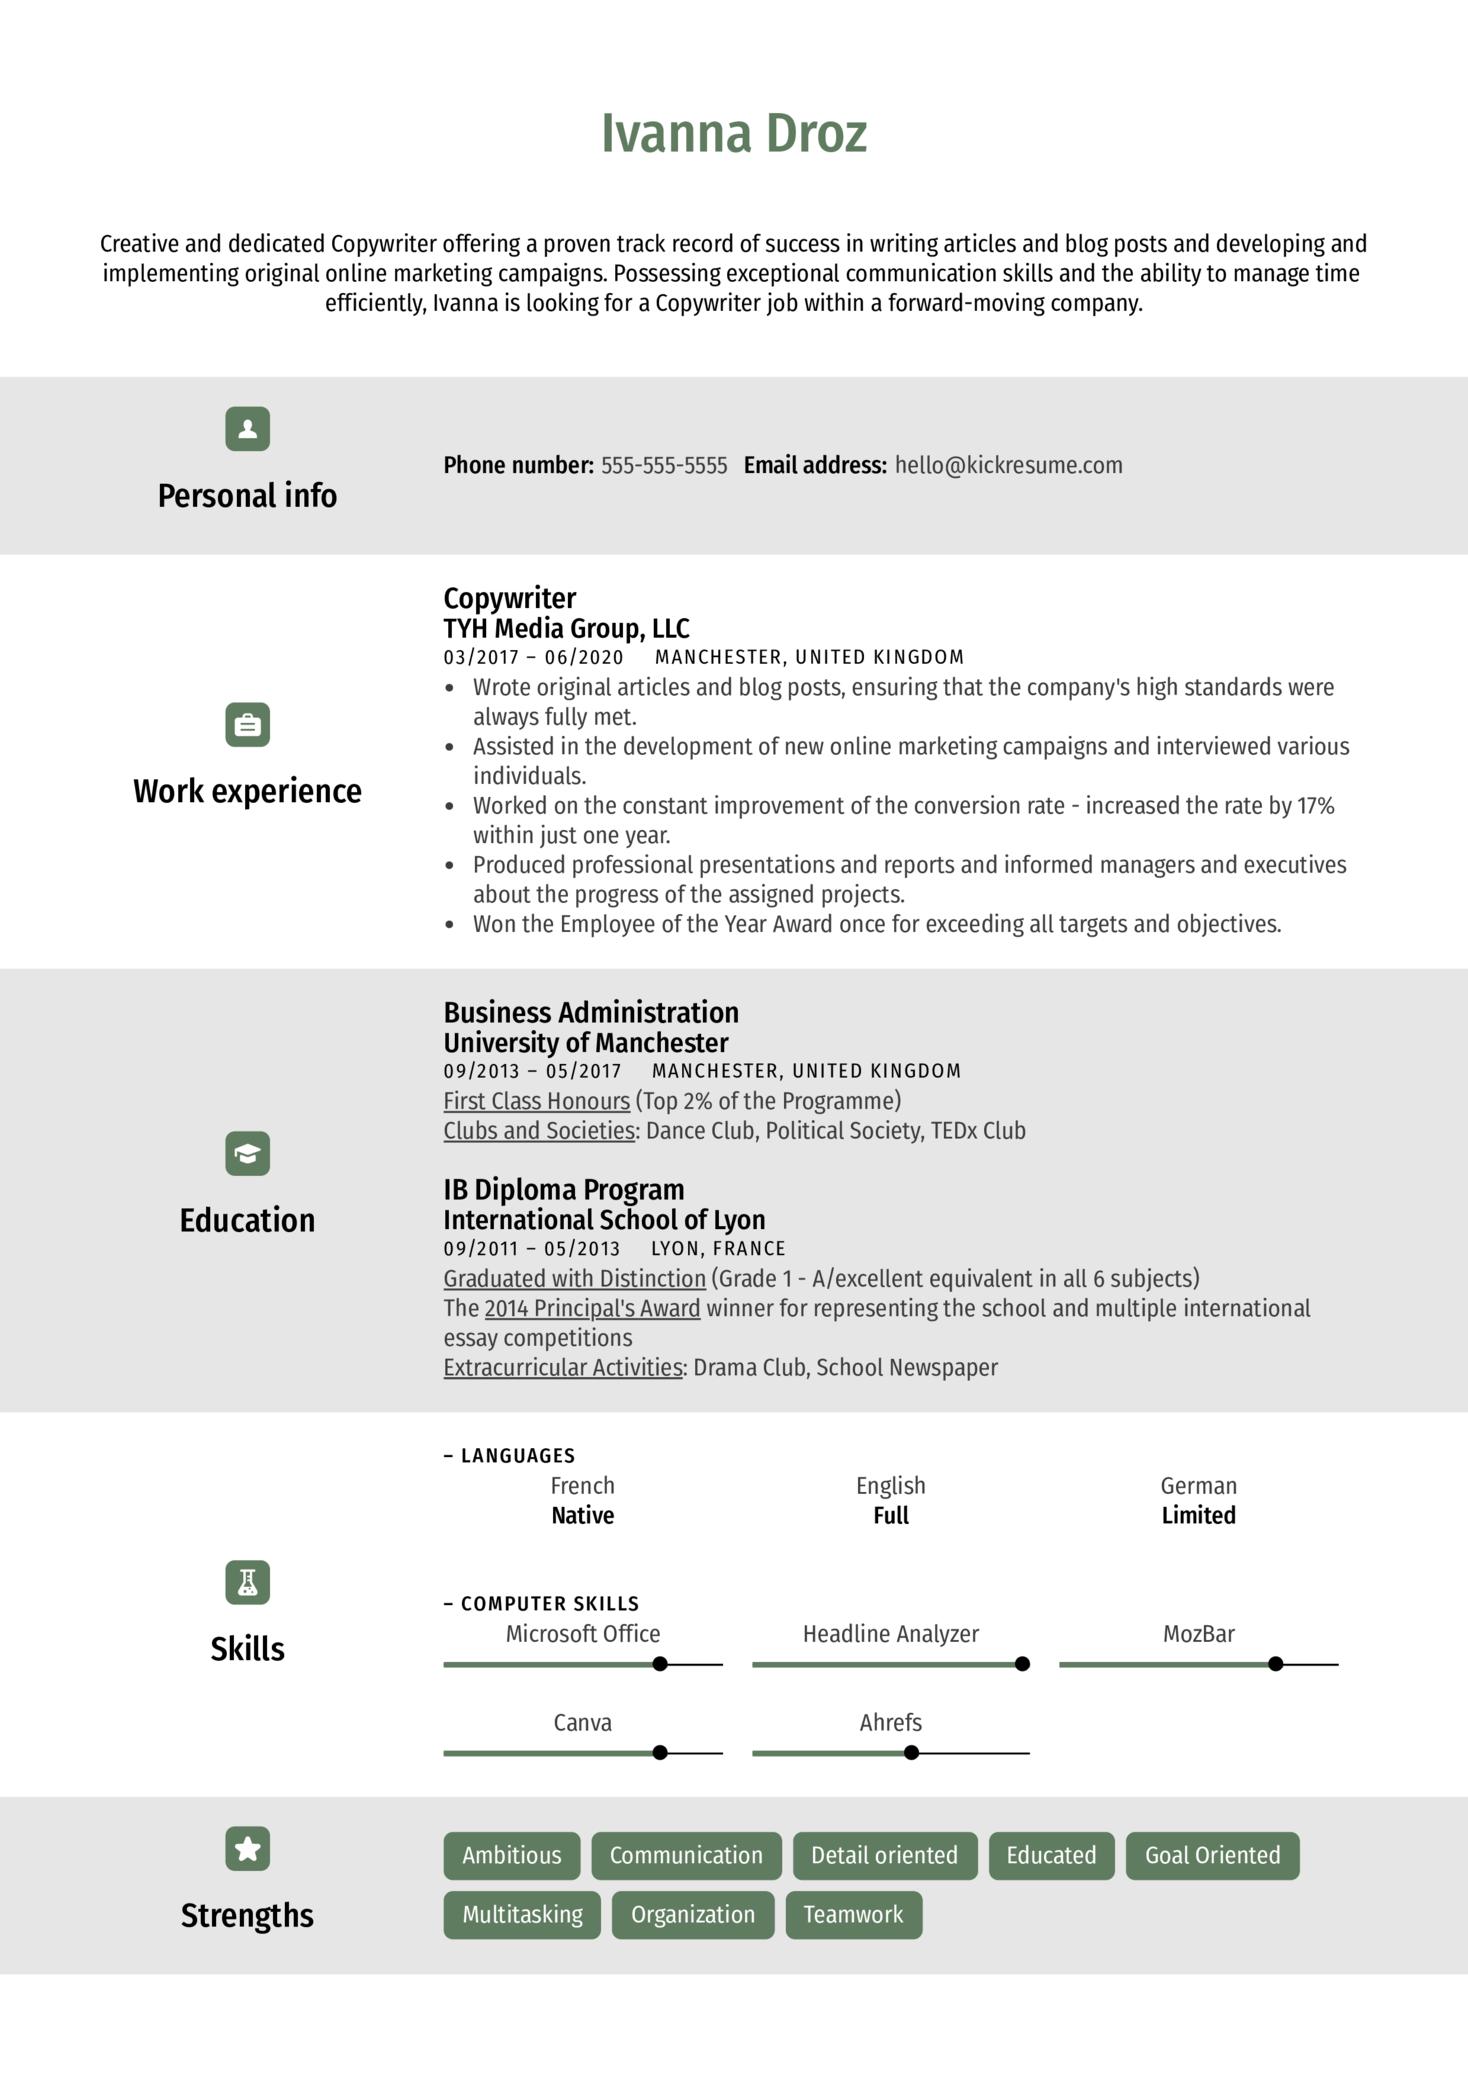 Creative Copywriter Resume Template (Part 1)